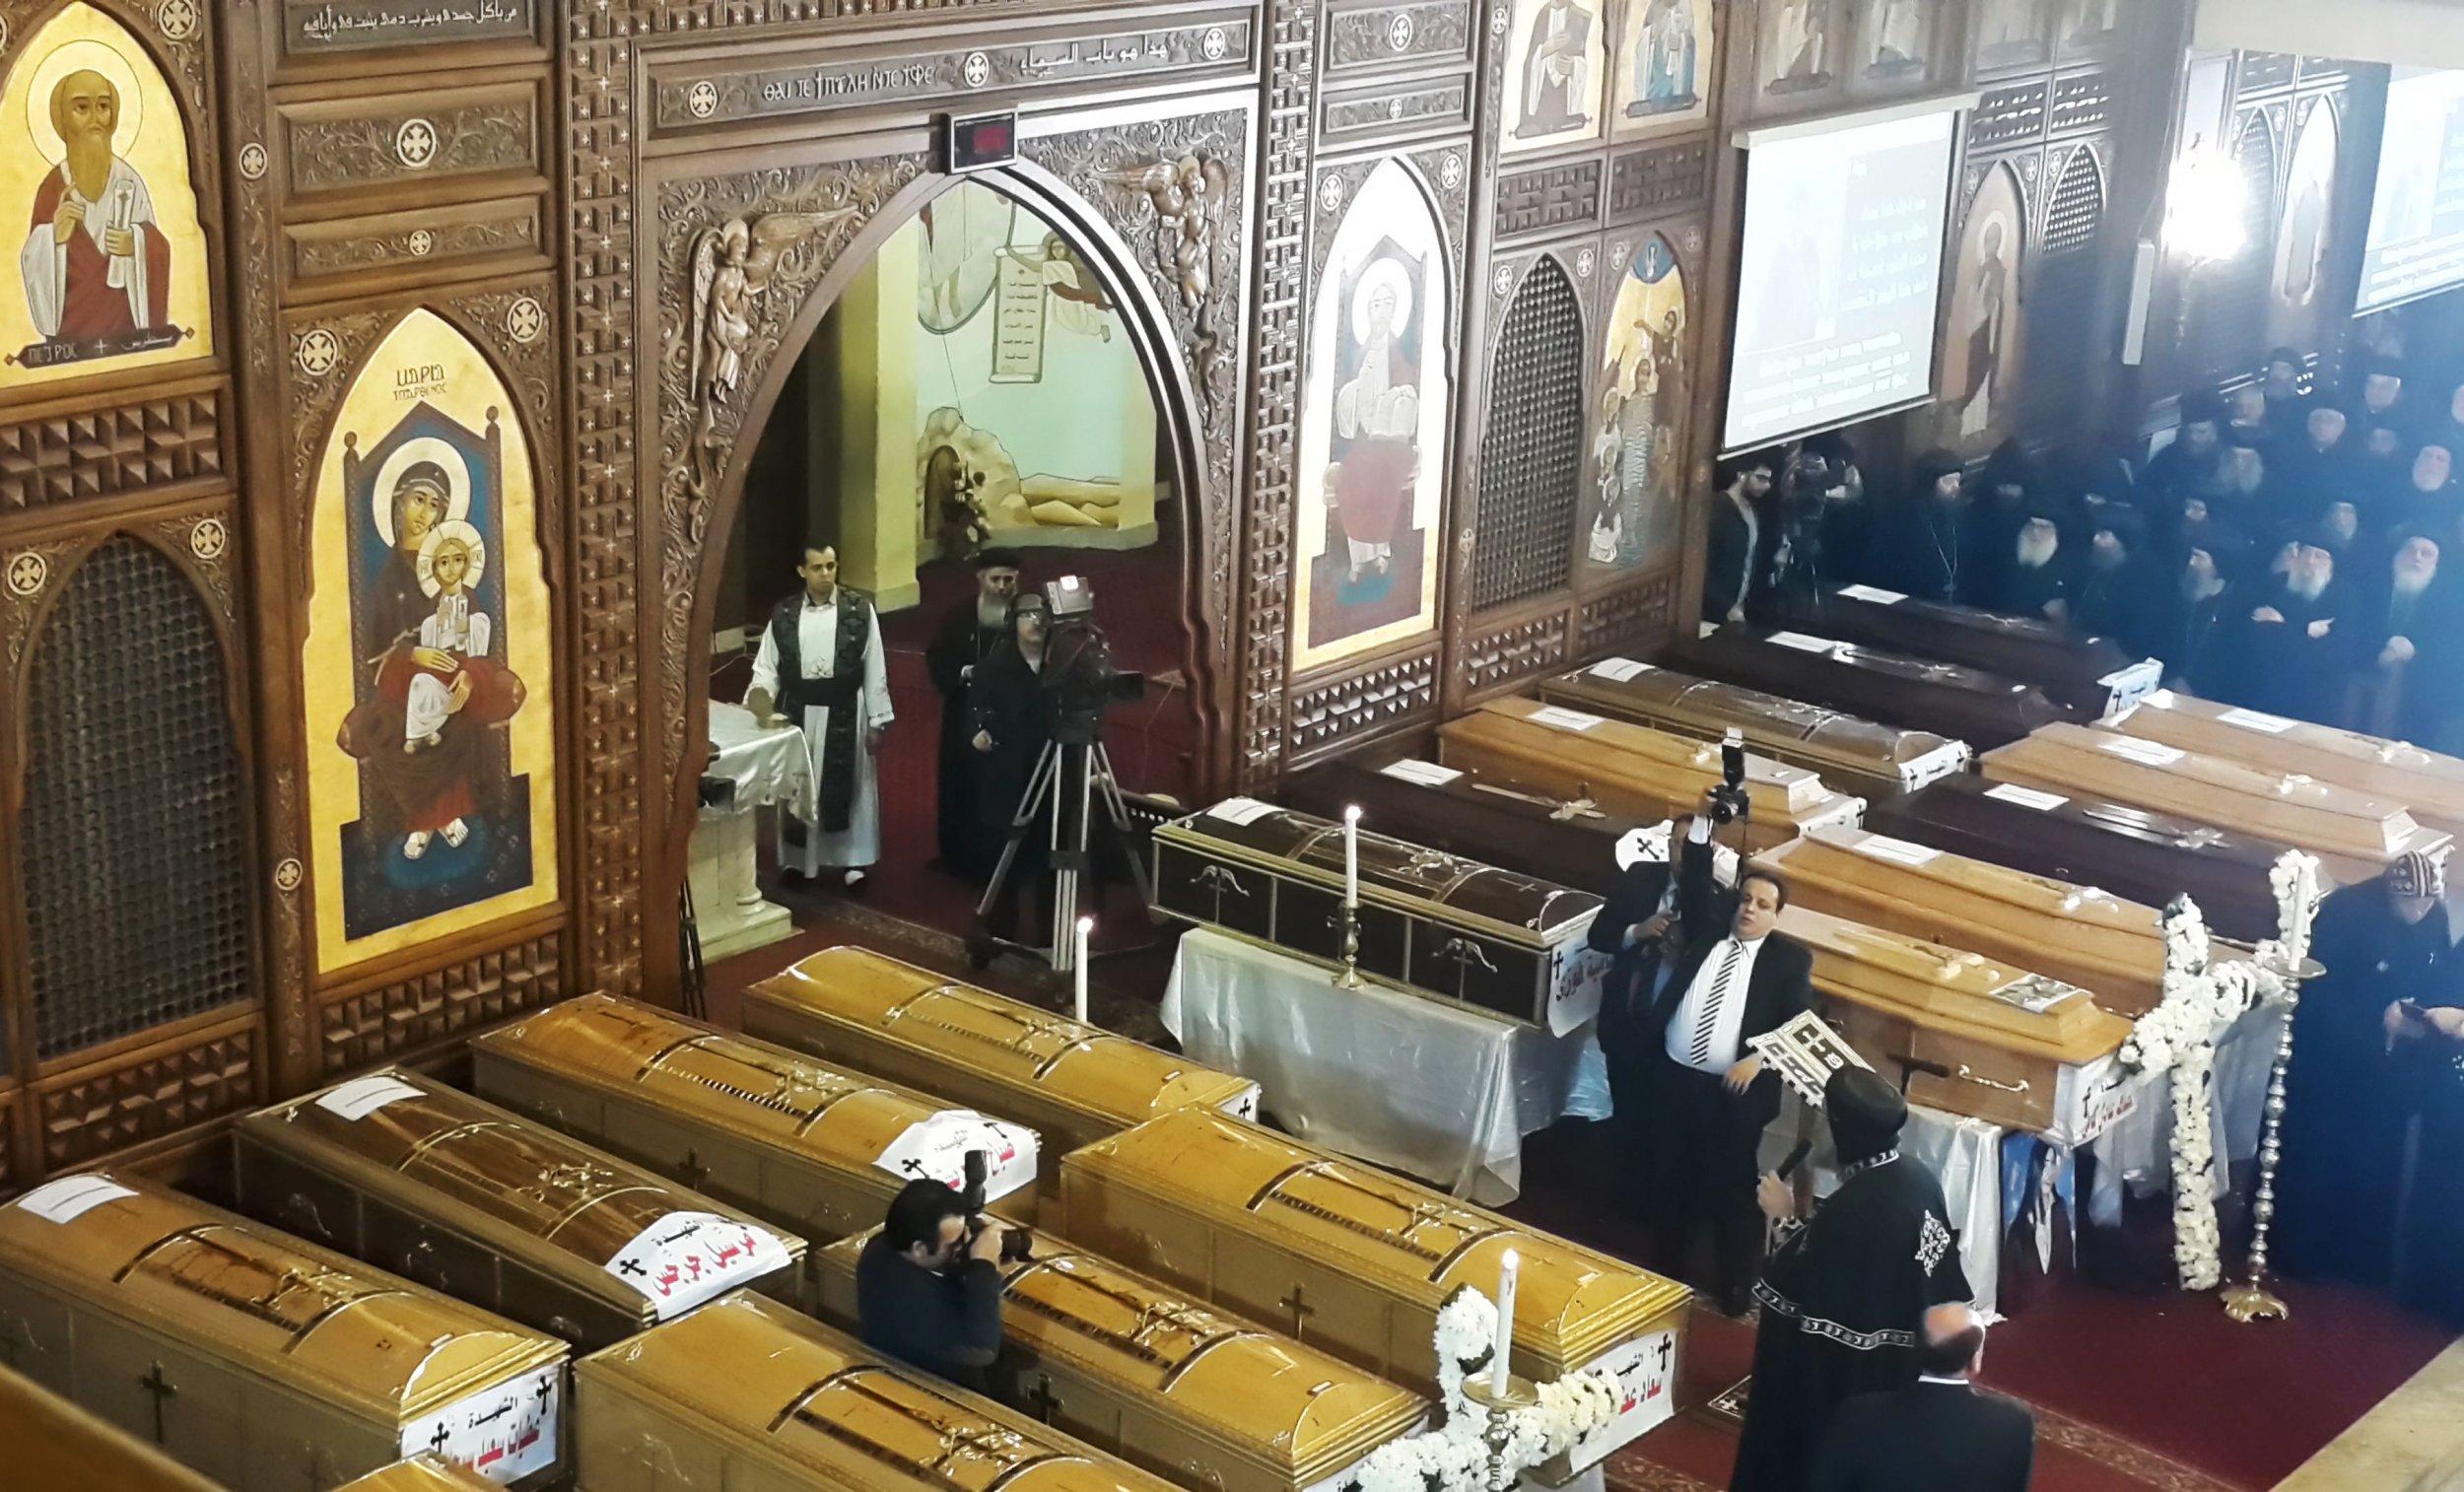 Cairo church bombing funeral